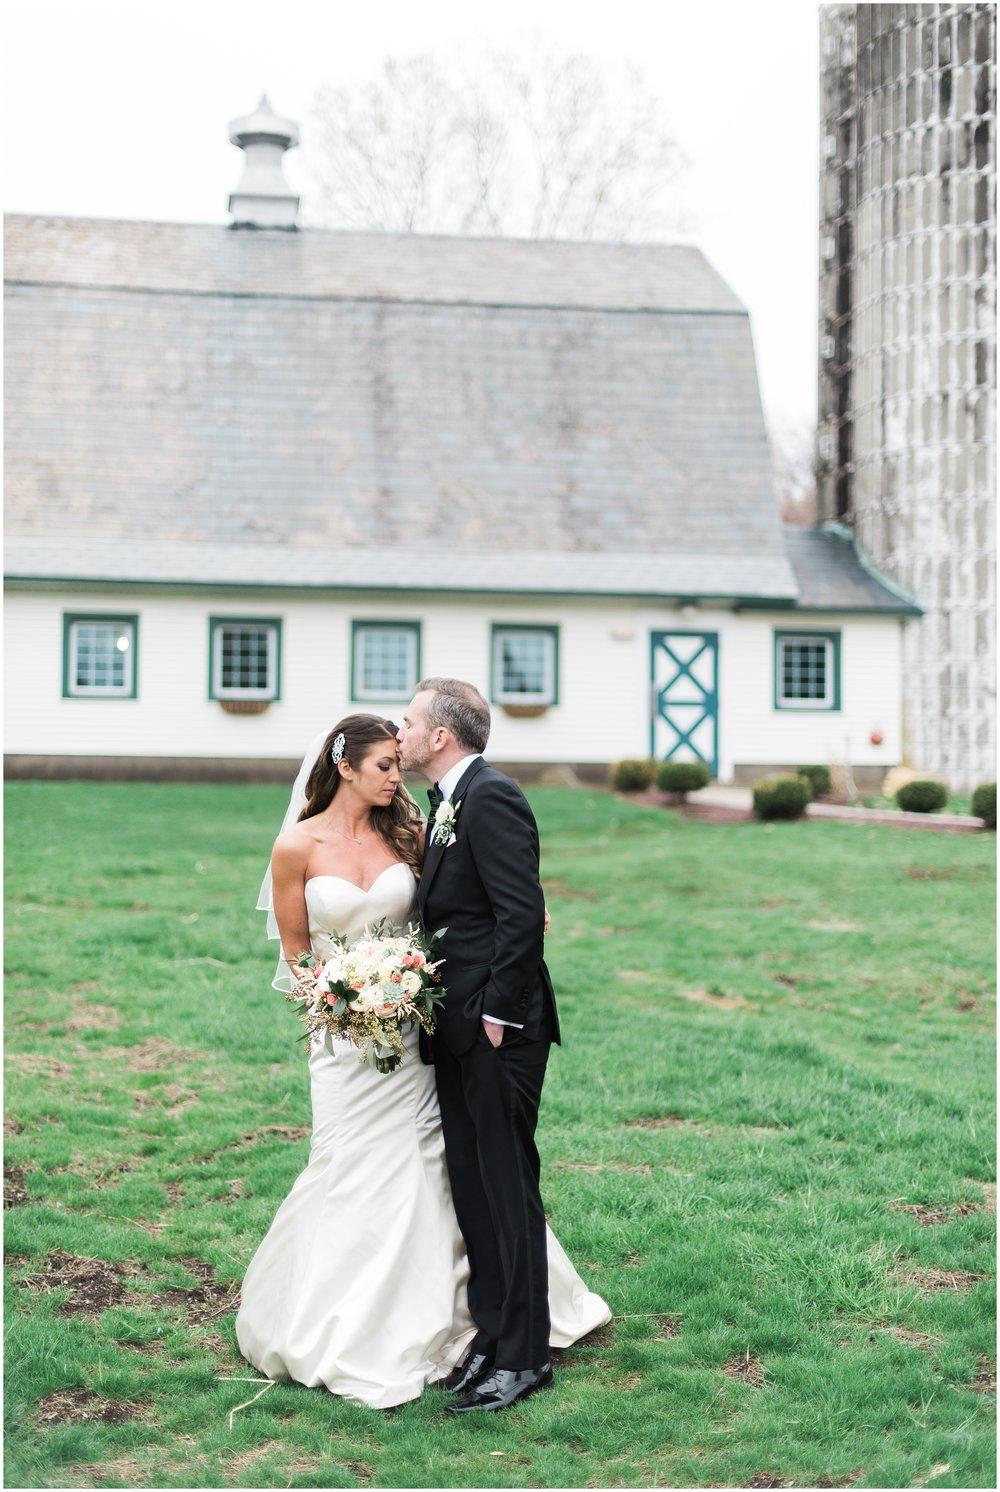 Perona-Farms-Outdoor-NJ-Barn-Farm-Wedding-Photo-_0100.jpg